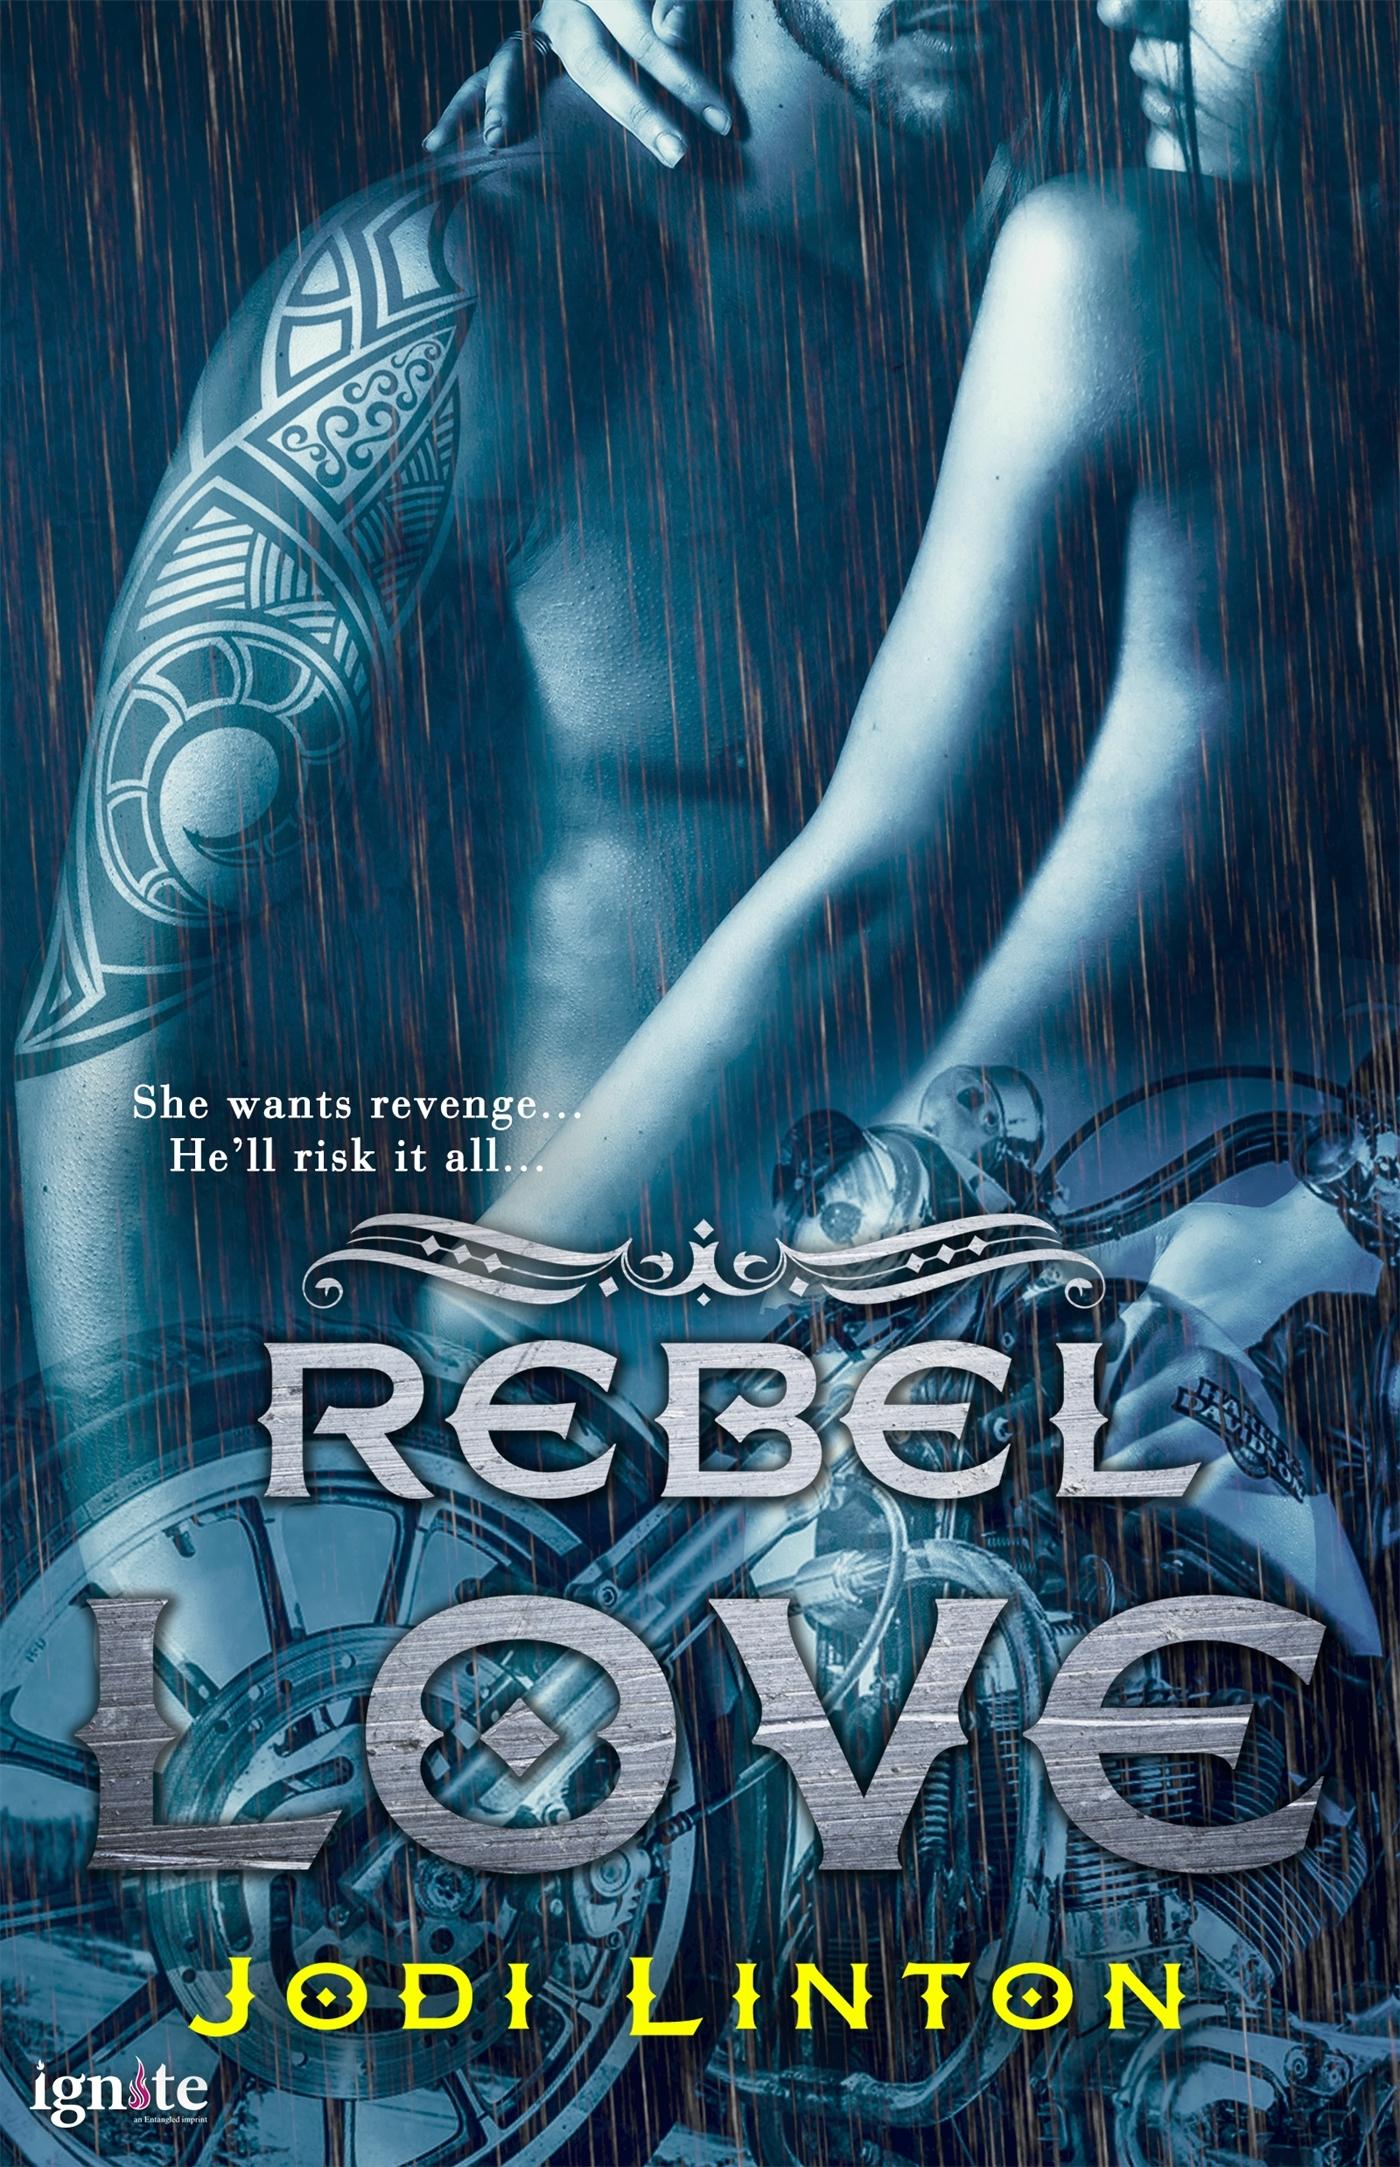 Rebel Love Jodi Linton